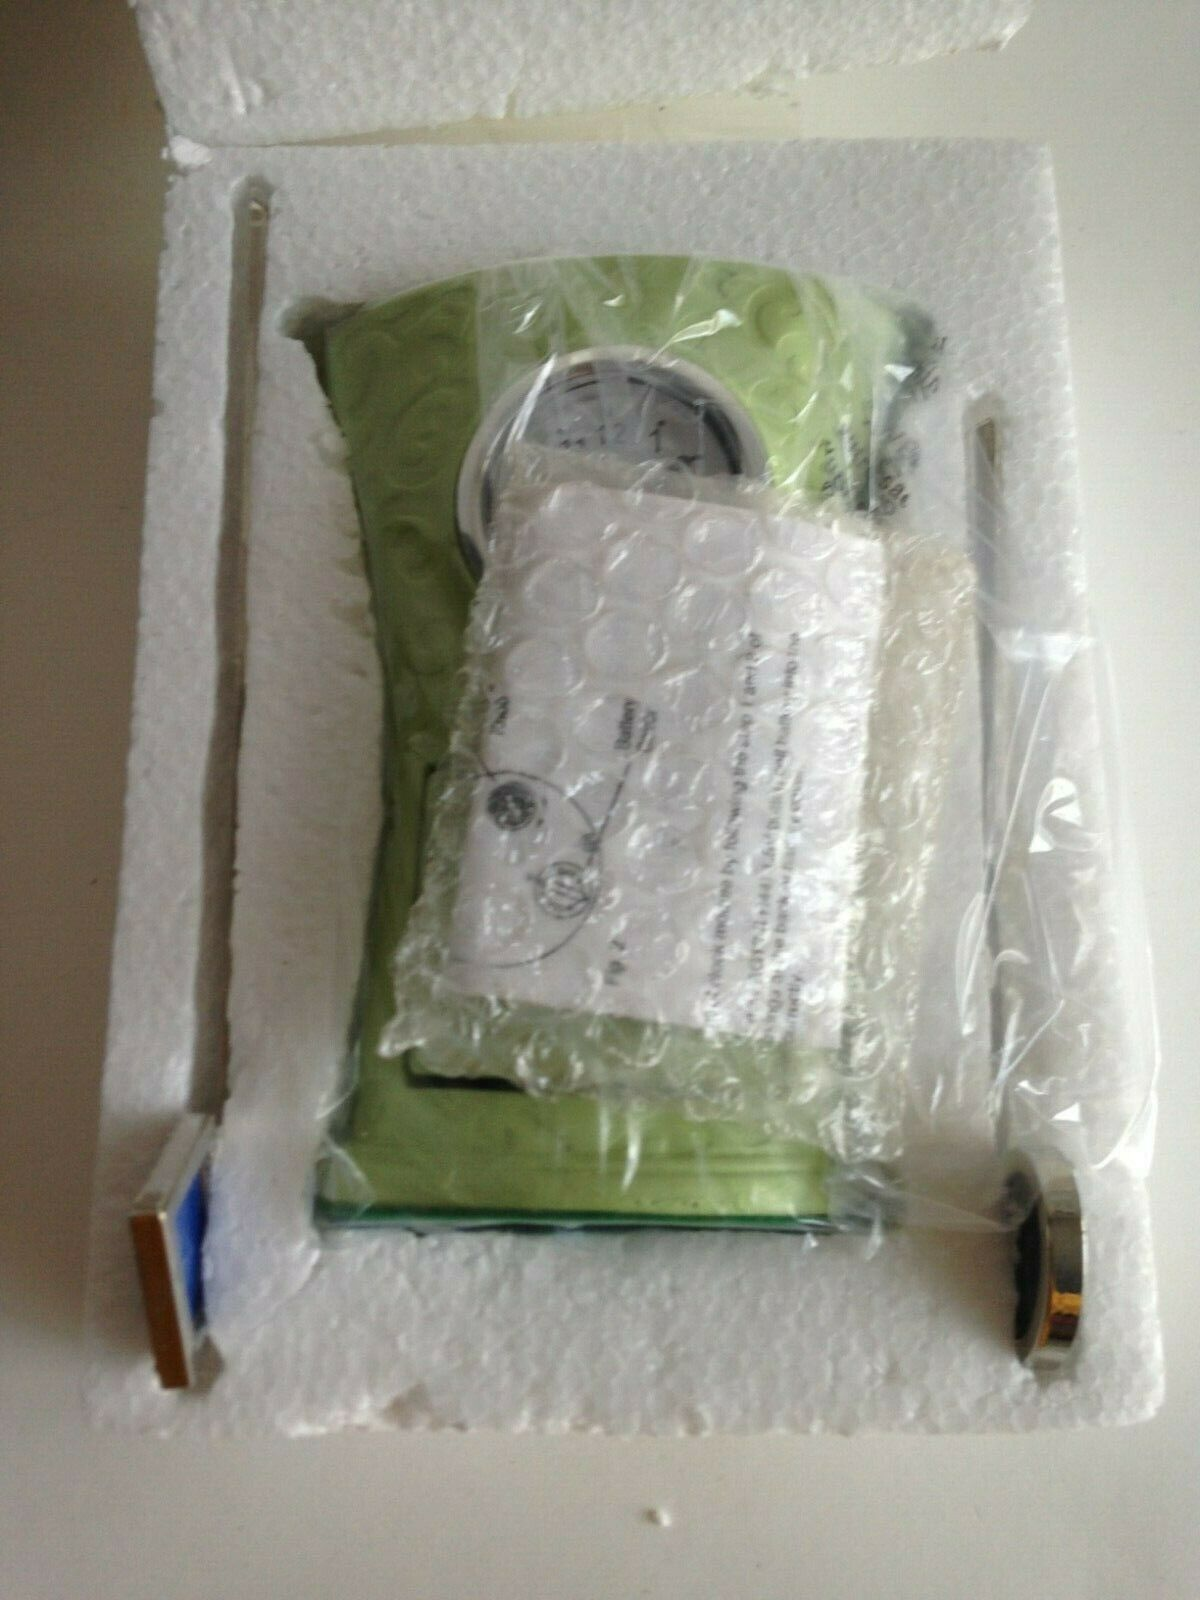 "AVON DECORATIVE ACCENT CLOCK HARLOGE GREEN 4"" x 5 3/8"", 2 Stick Picture Frames"